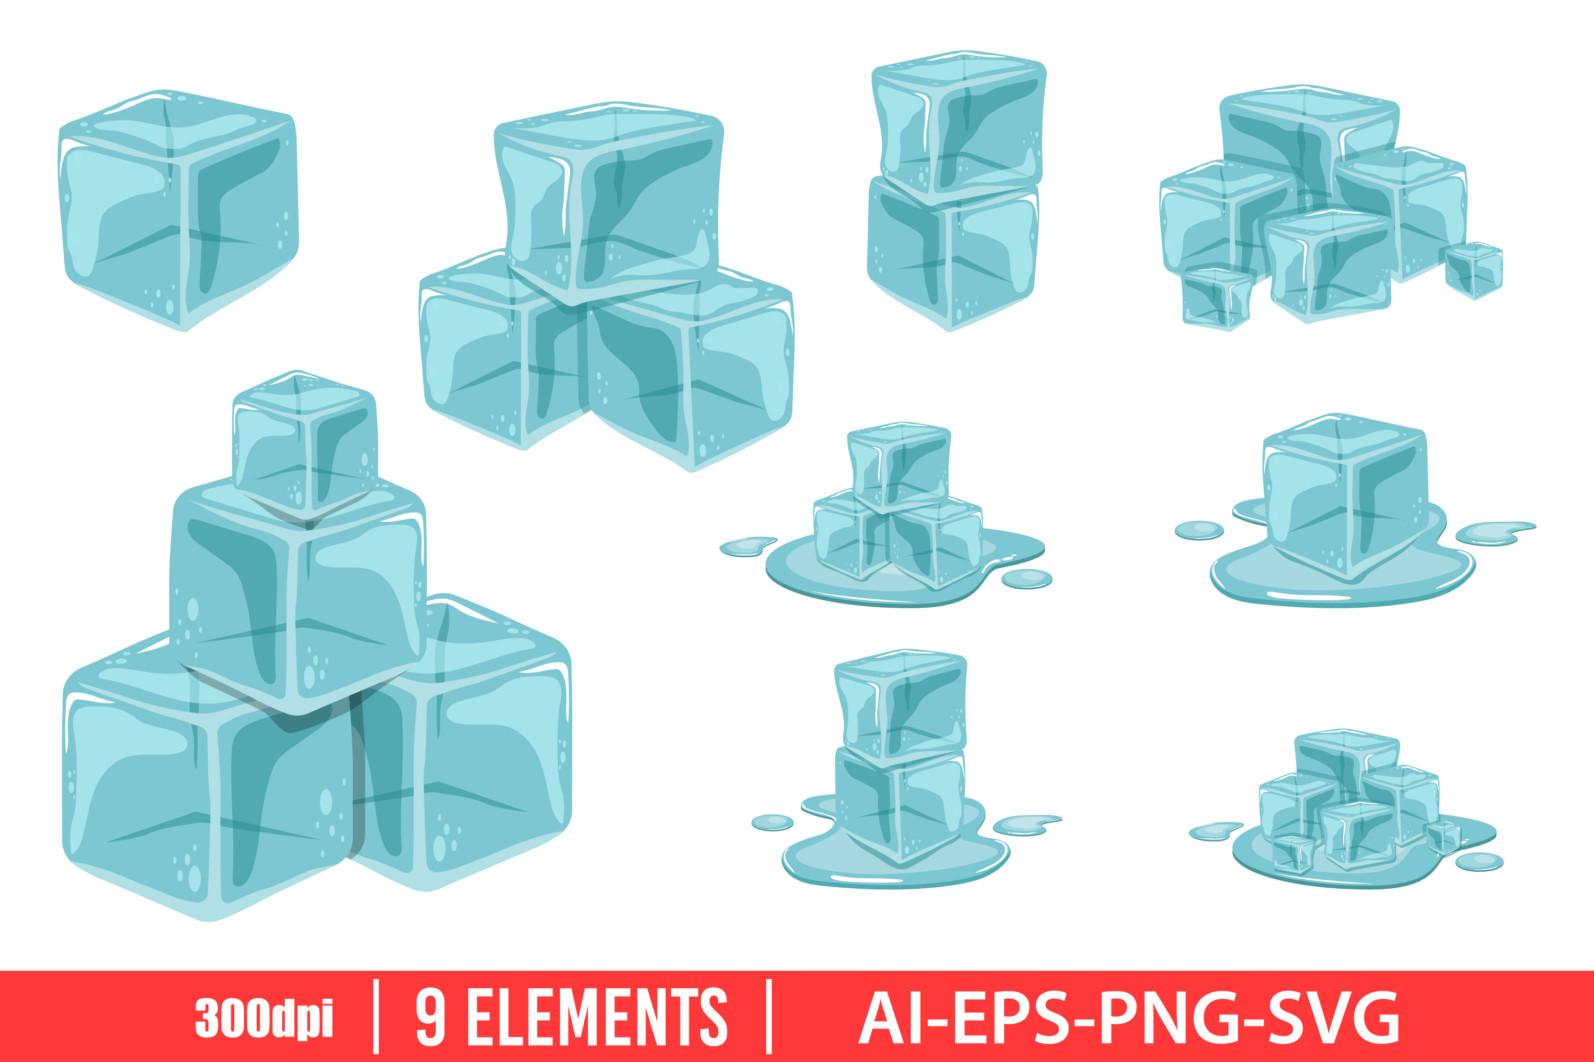 Ice cube clipart vector design illustration. Ice cube set. Vector Clipart Print - ICE CUBE scaled -